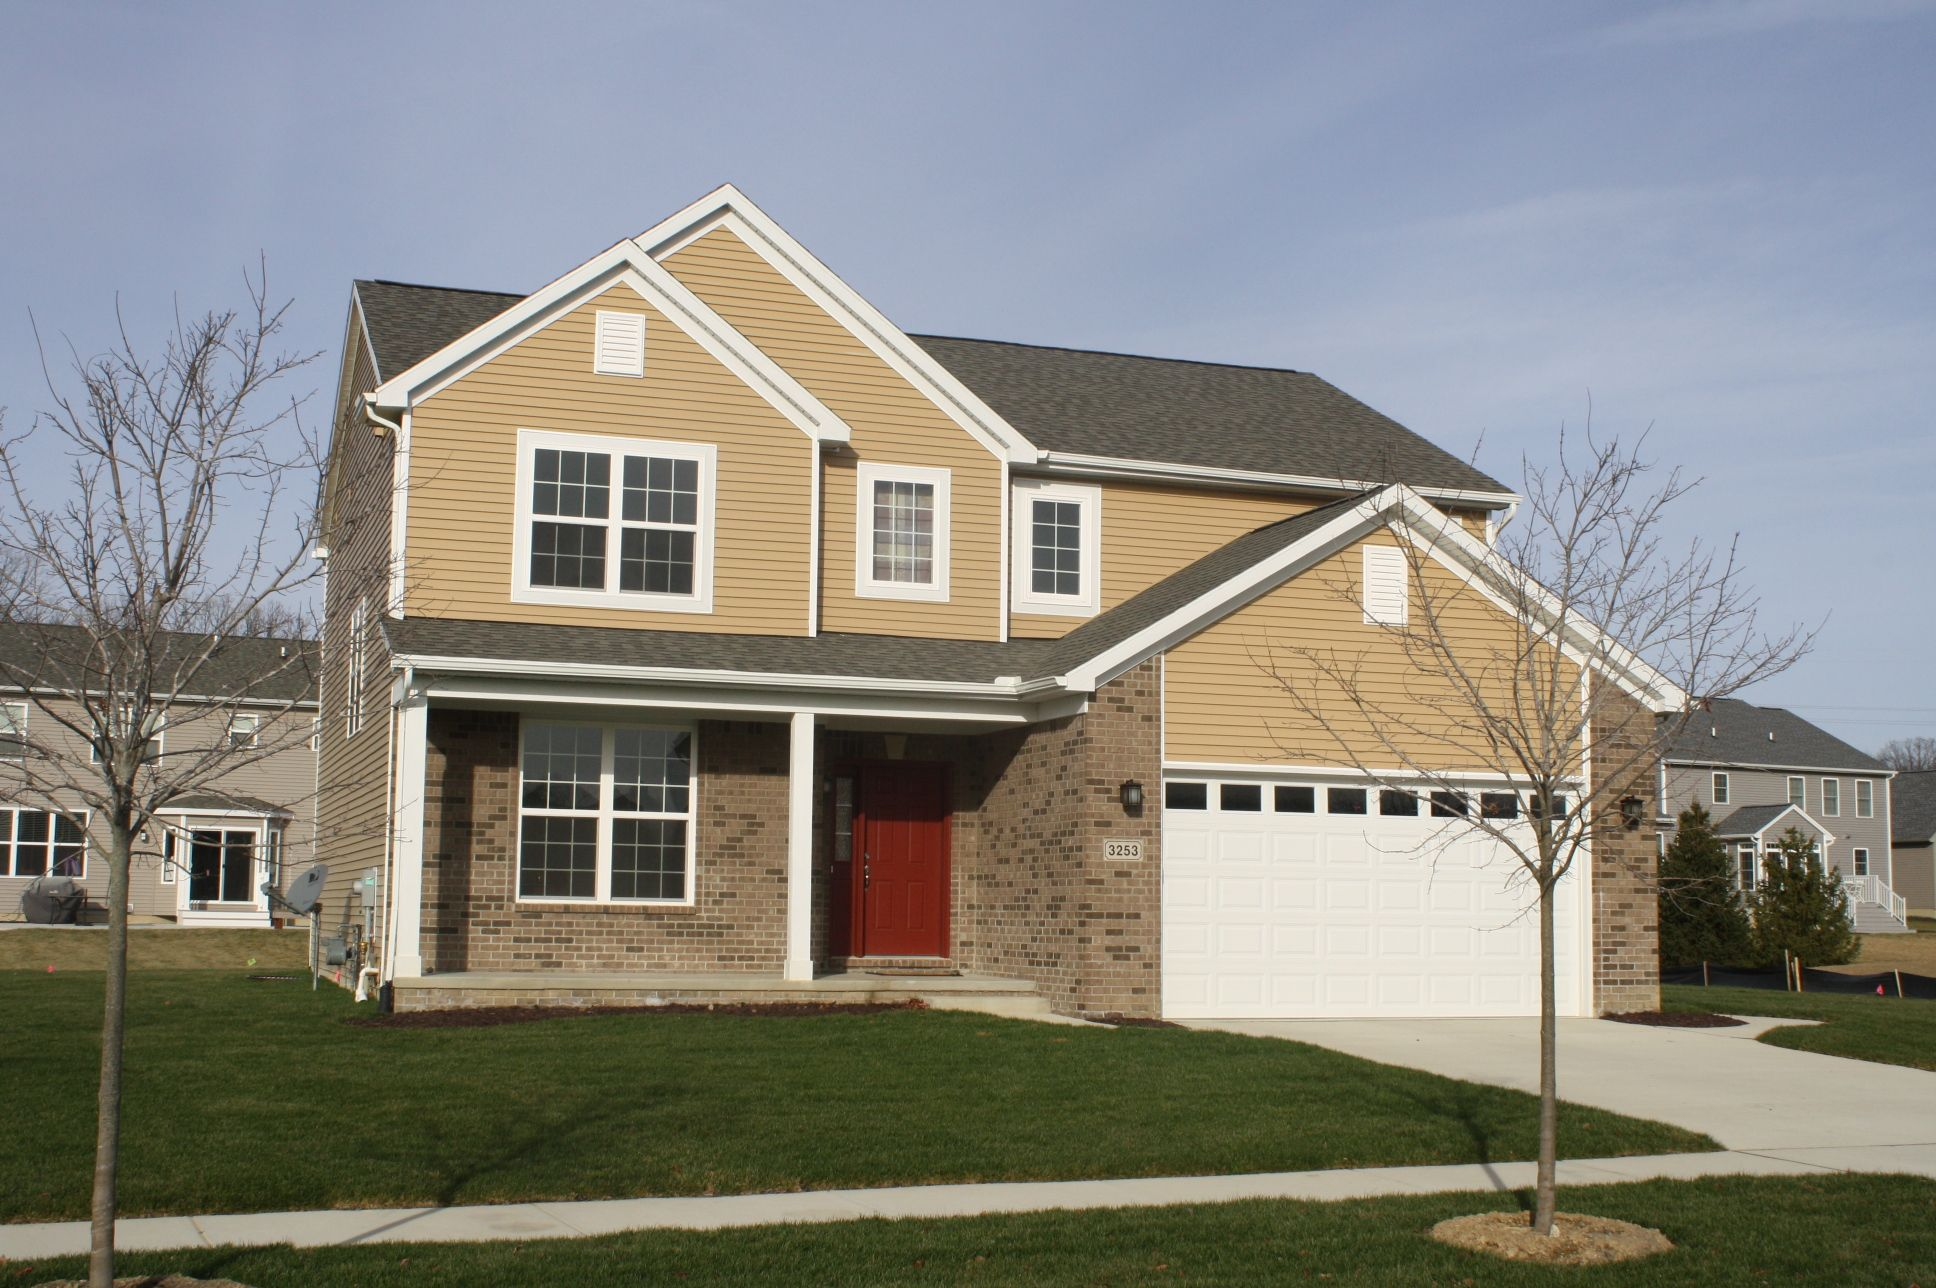 3253 eastridge home for sale in dexter distinctive